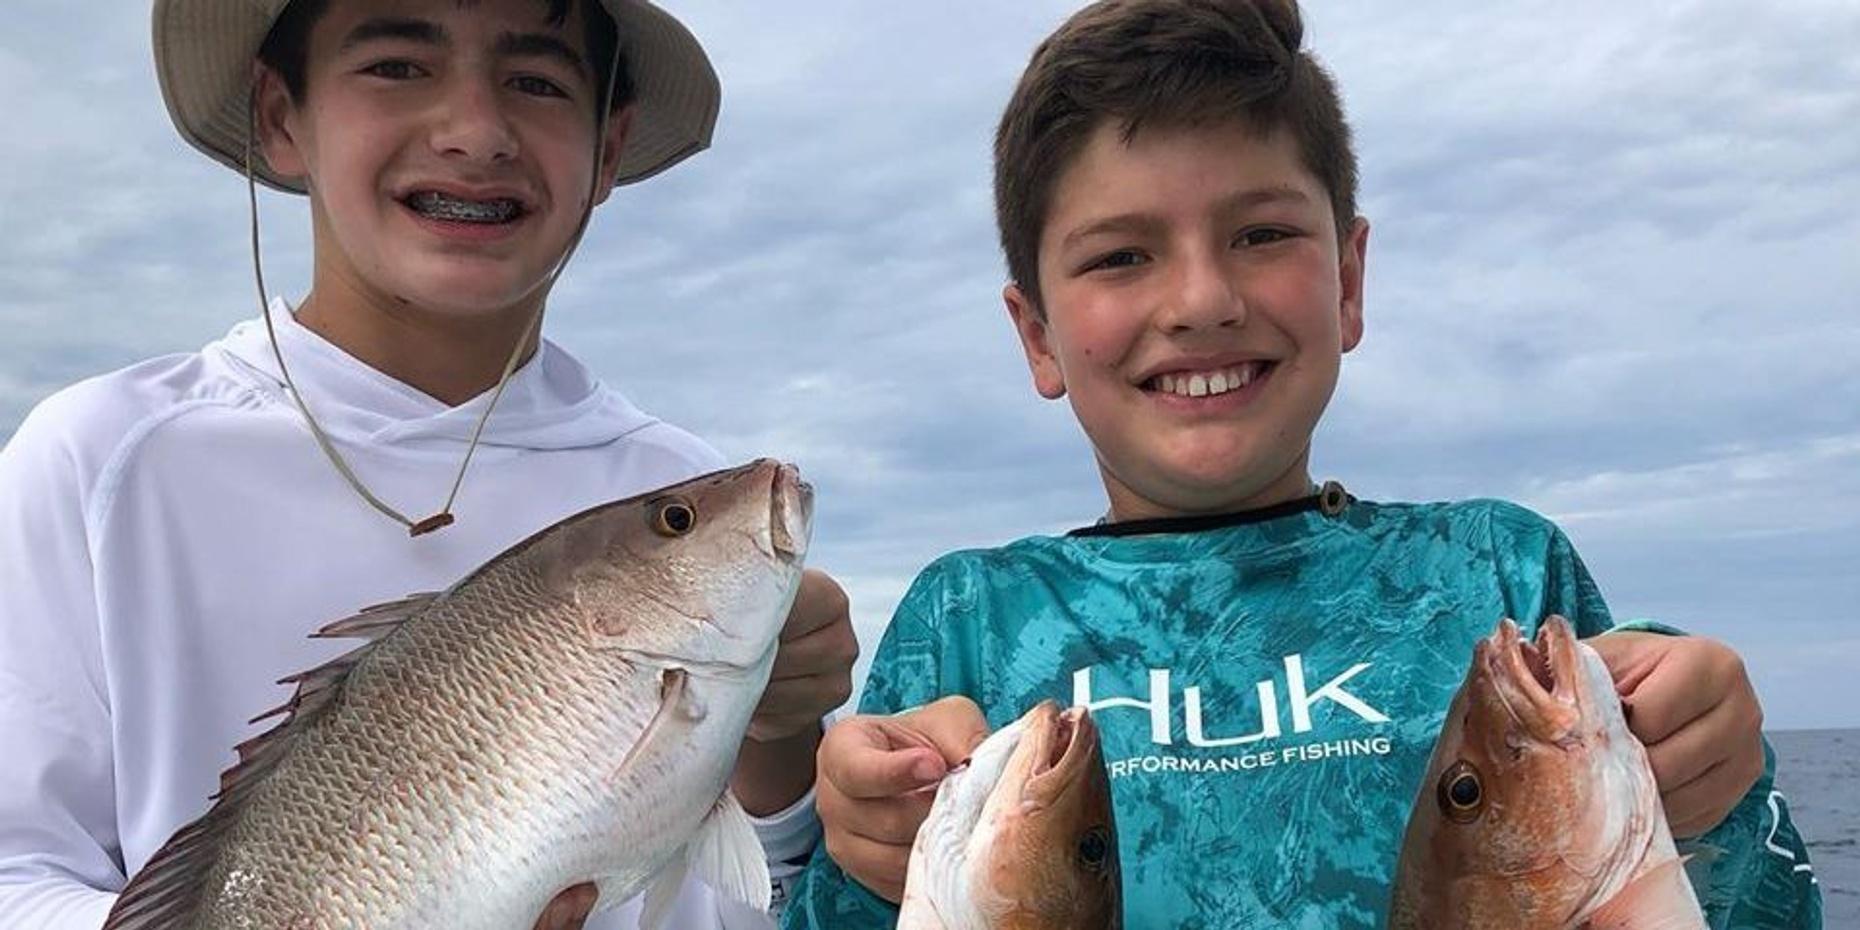 Kids' Inshore Fishing Trip in Clearwater